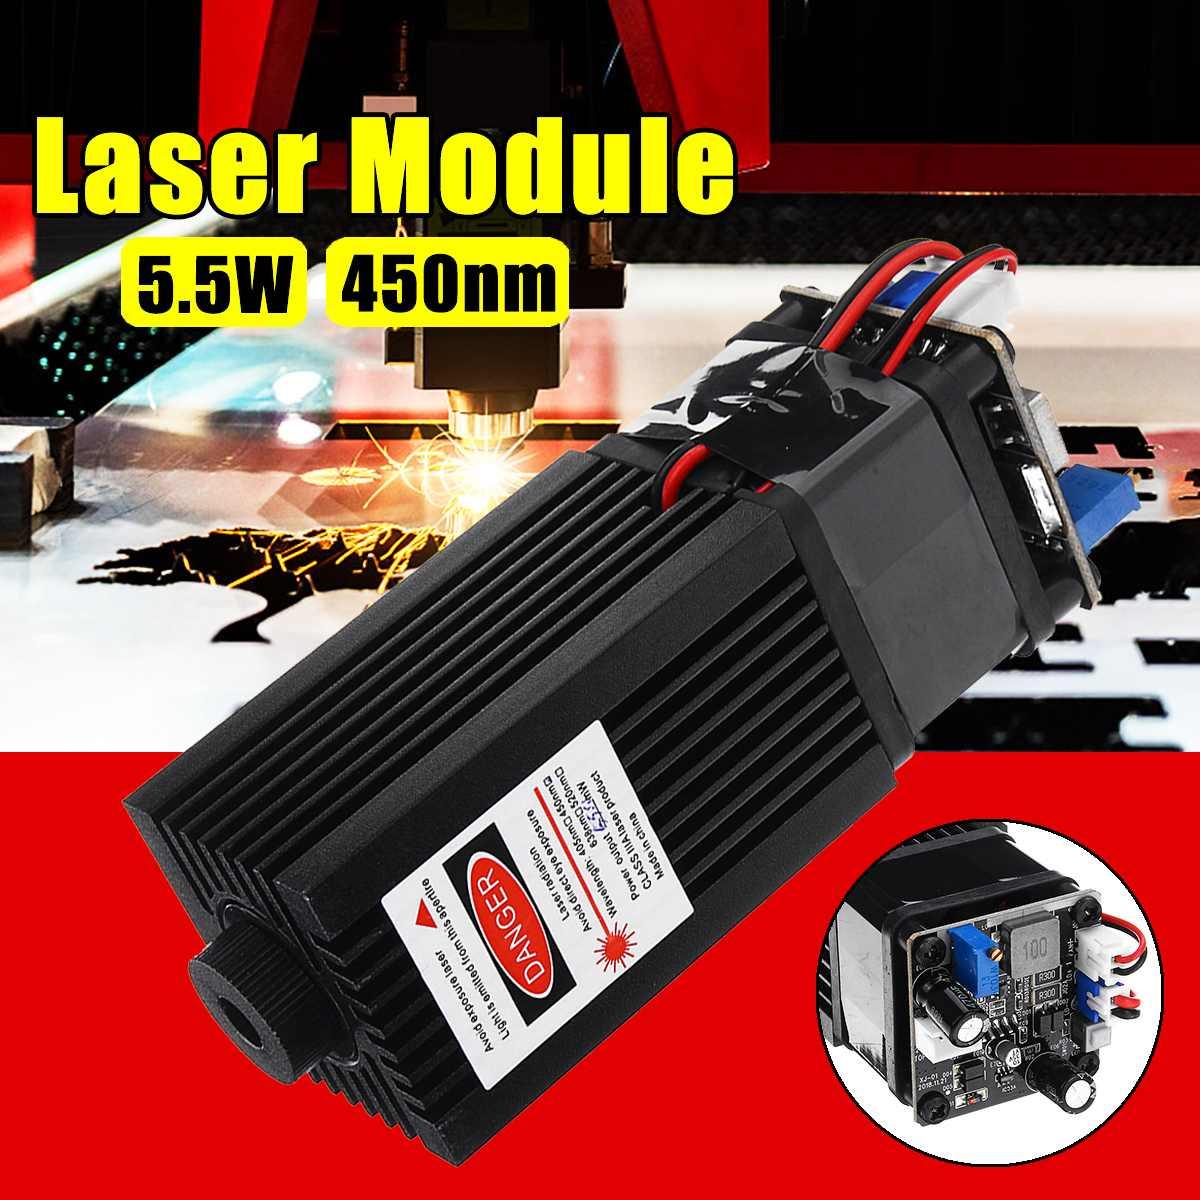 5500mW High Power 450NM Laser Module 5.5W Laser Engraving Machine Module Focusable TTL Modulation Engraving Tool Dropshipping